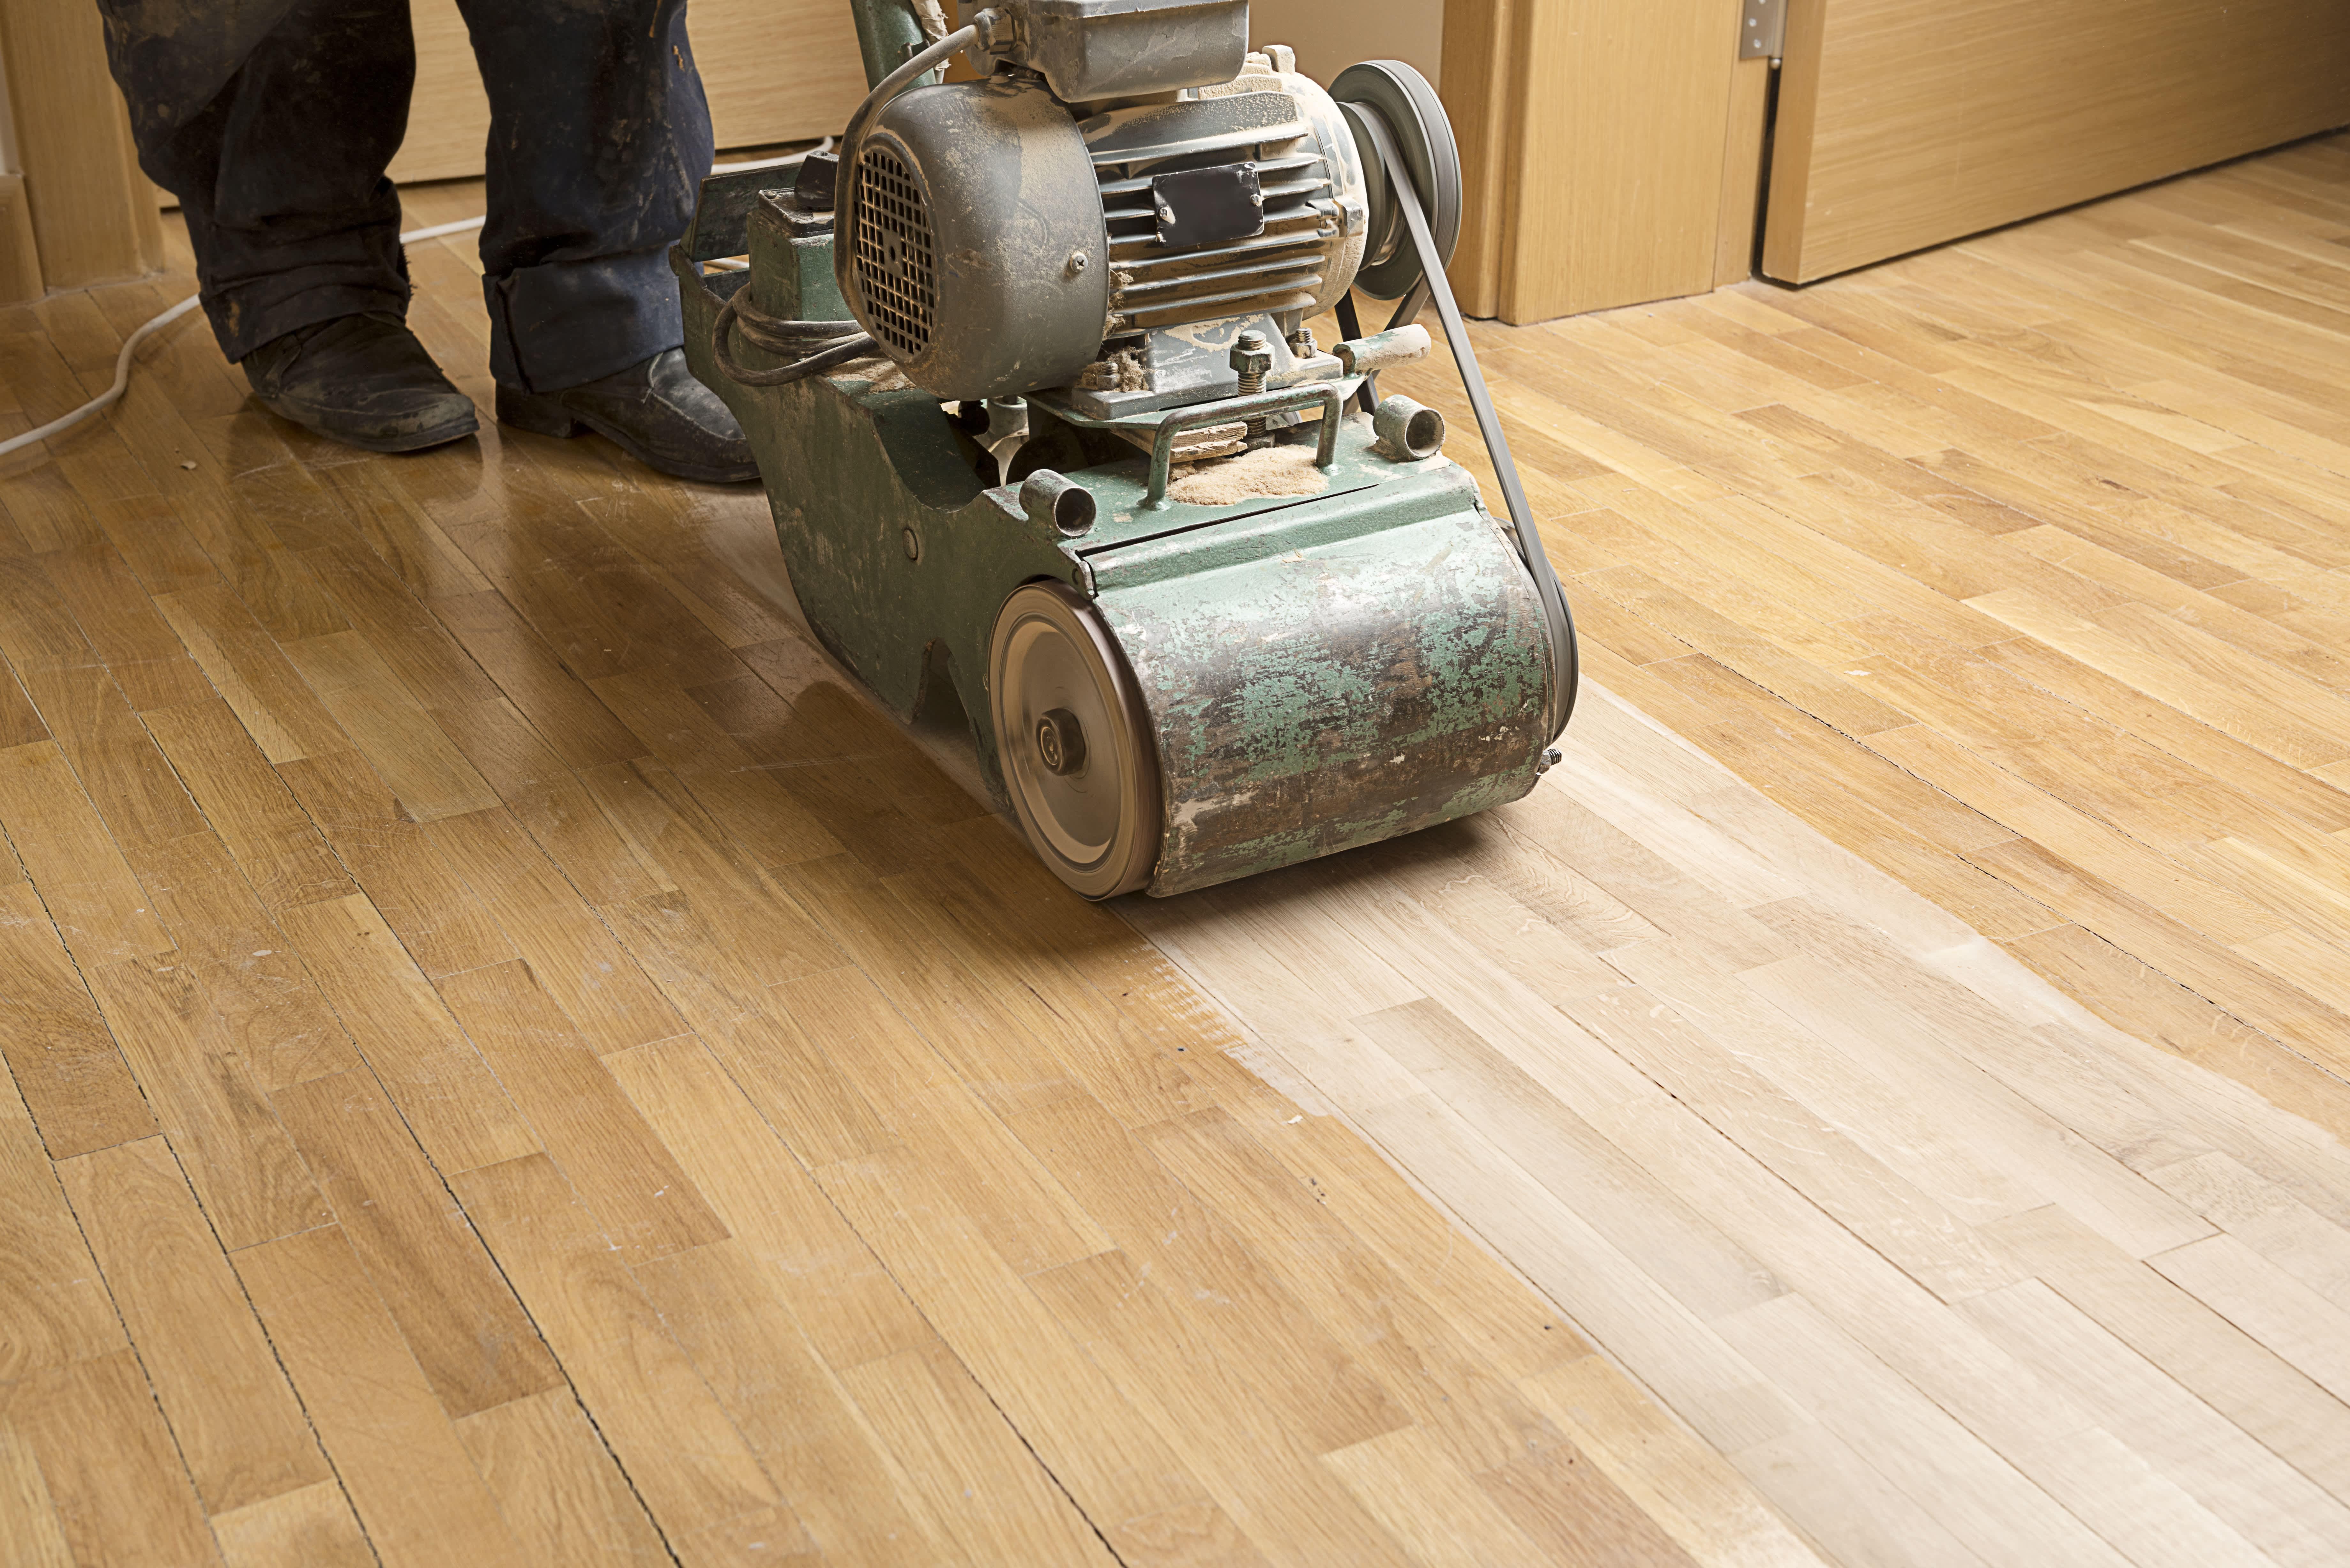 Sanding & Refinishing Hardwood Floors